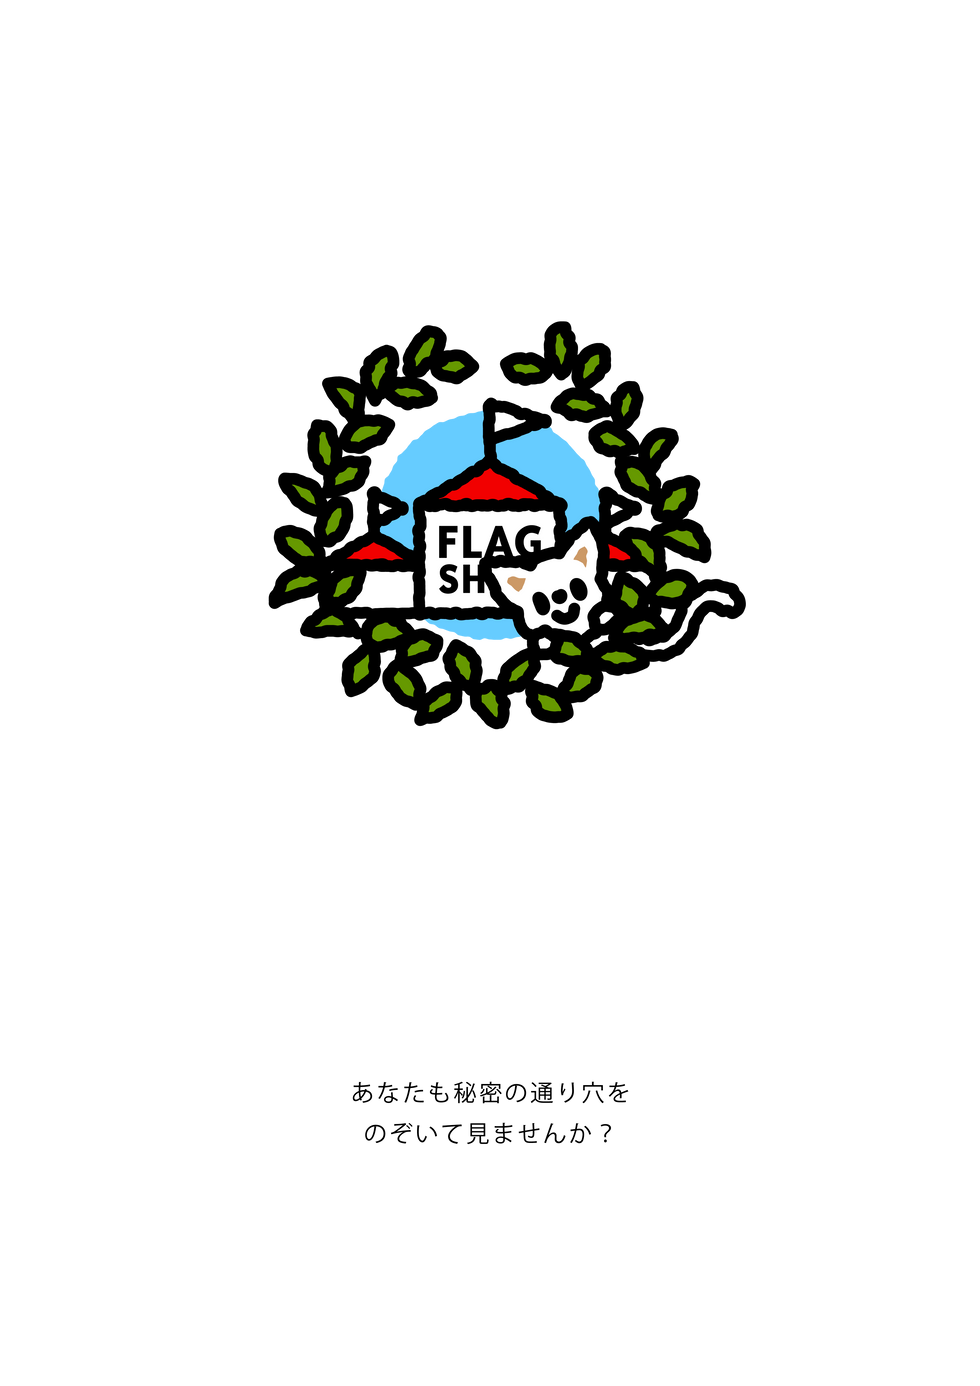 flagshop-DATA-17.png